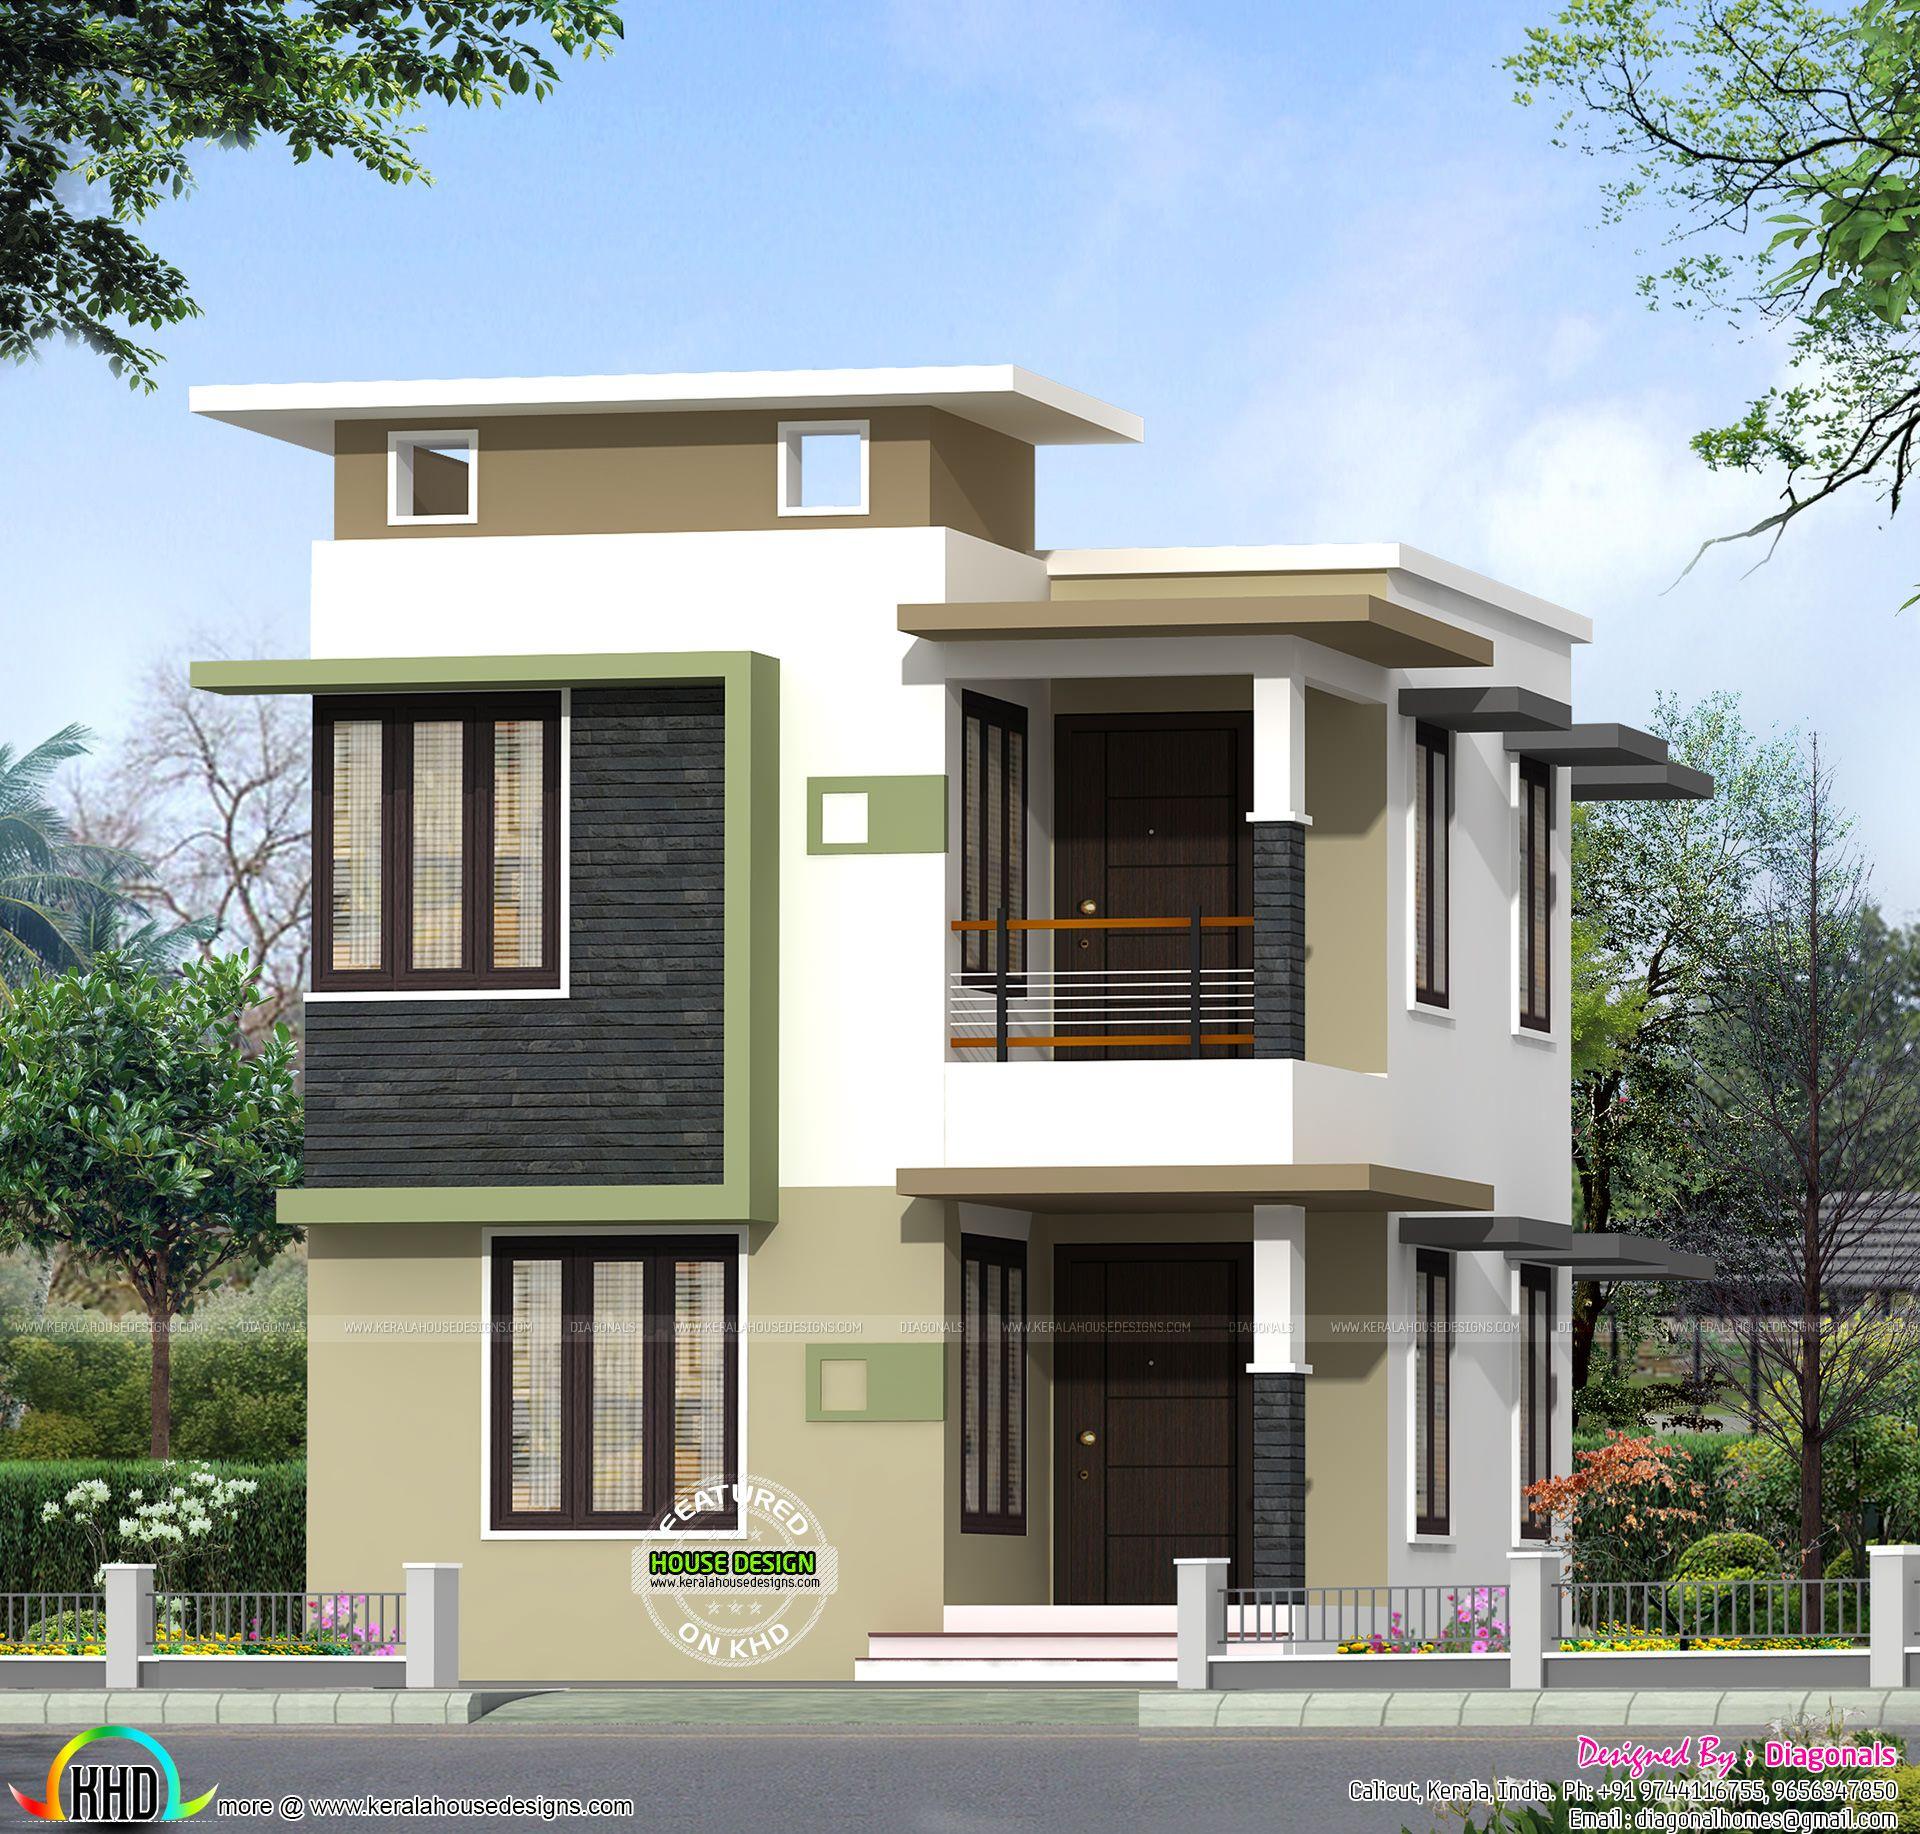 1631-sq-ft-house-plan.jpg (1920×1834)